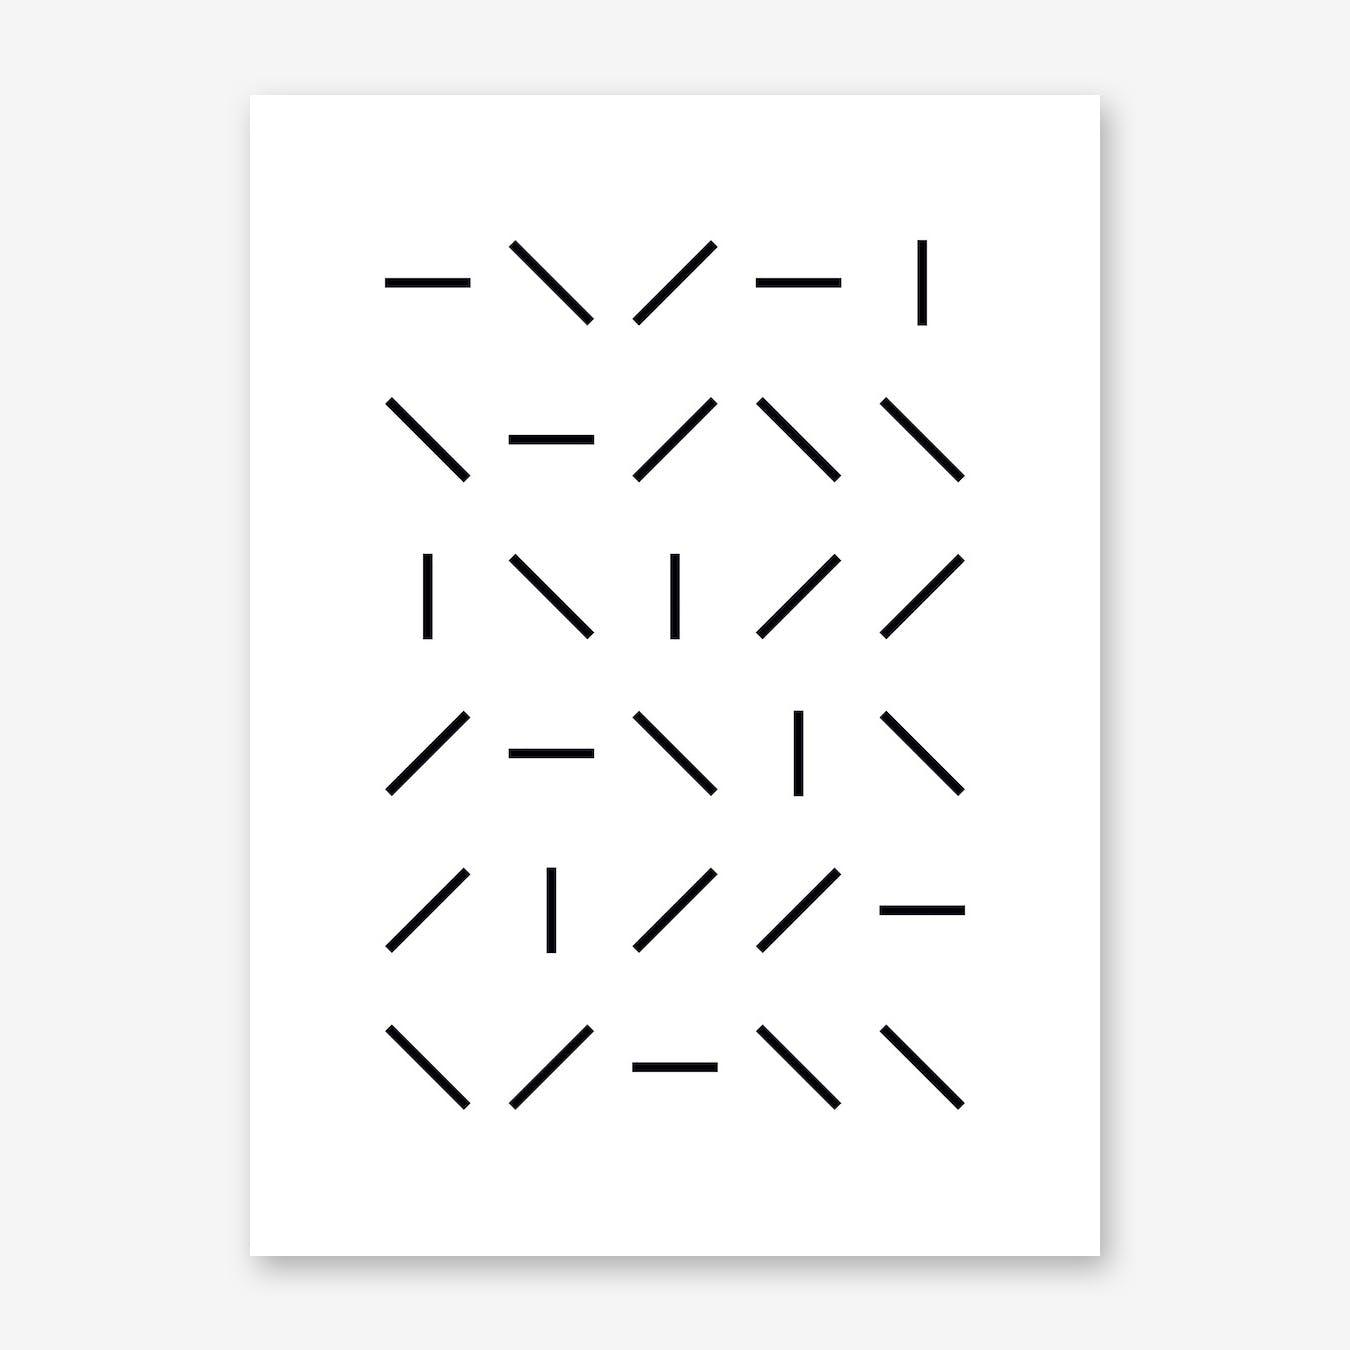 001 Print